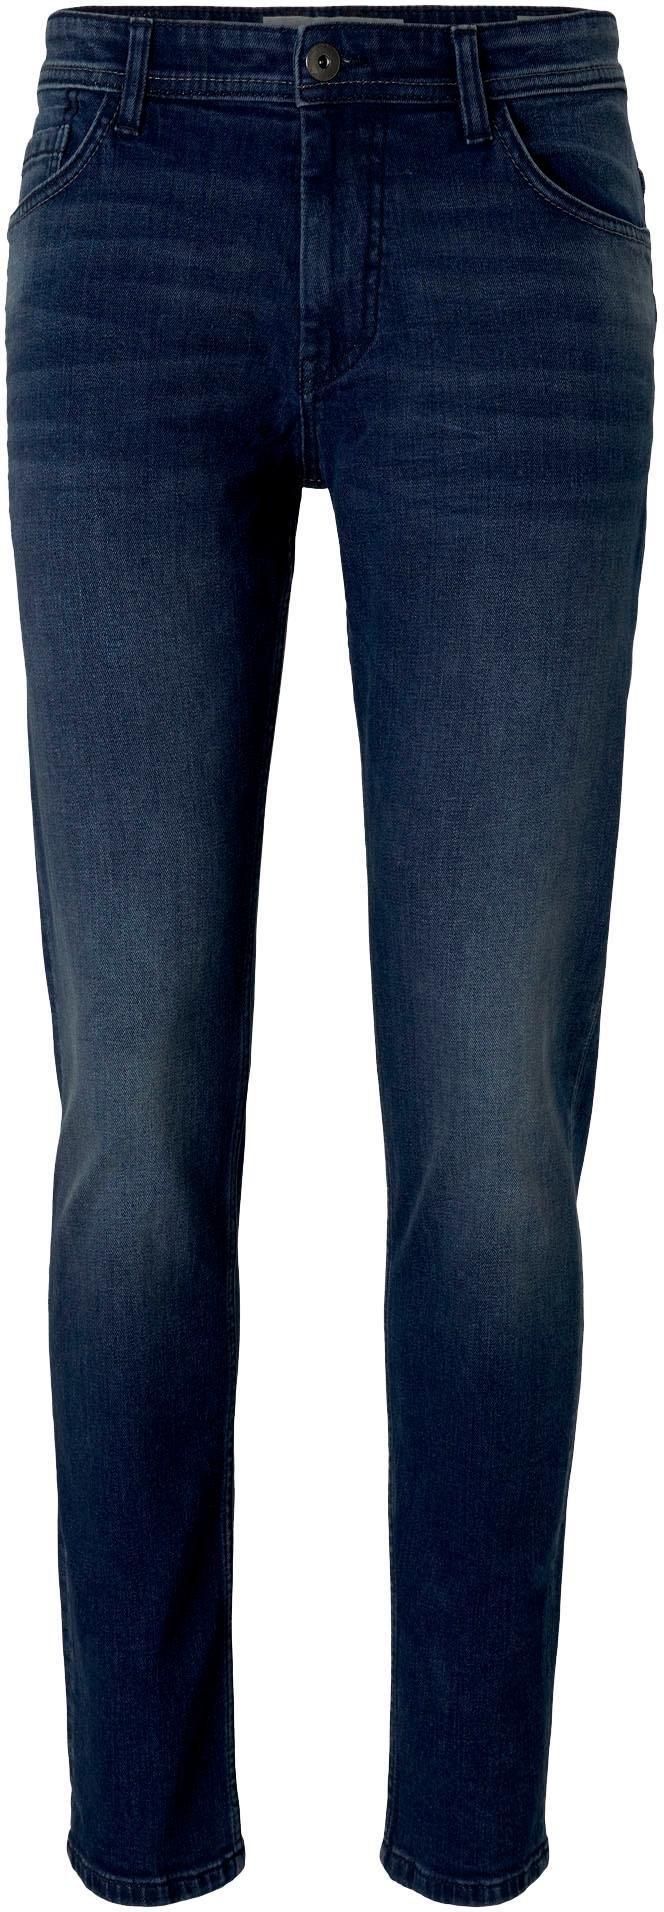 TOM TAILOR straight jeans - gratis ruilen op otto.nl